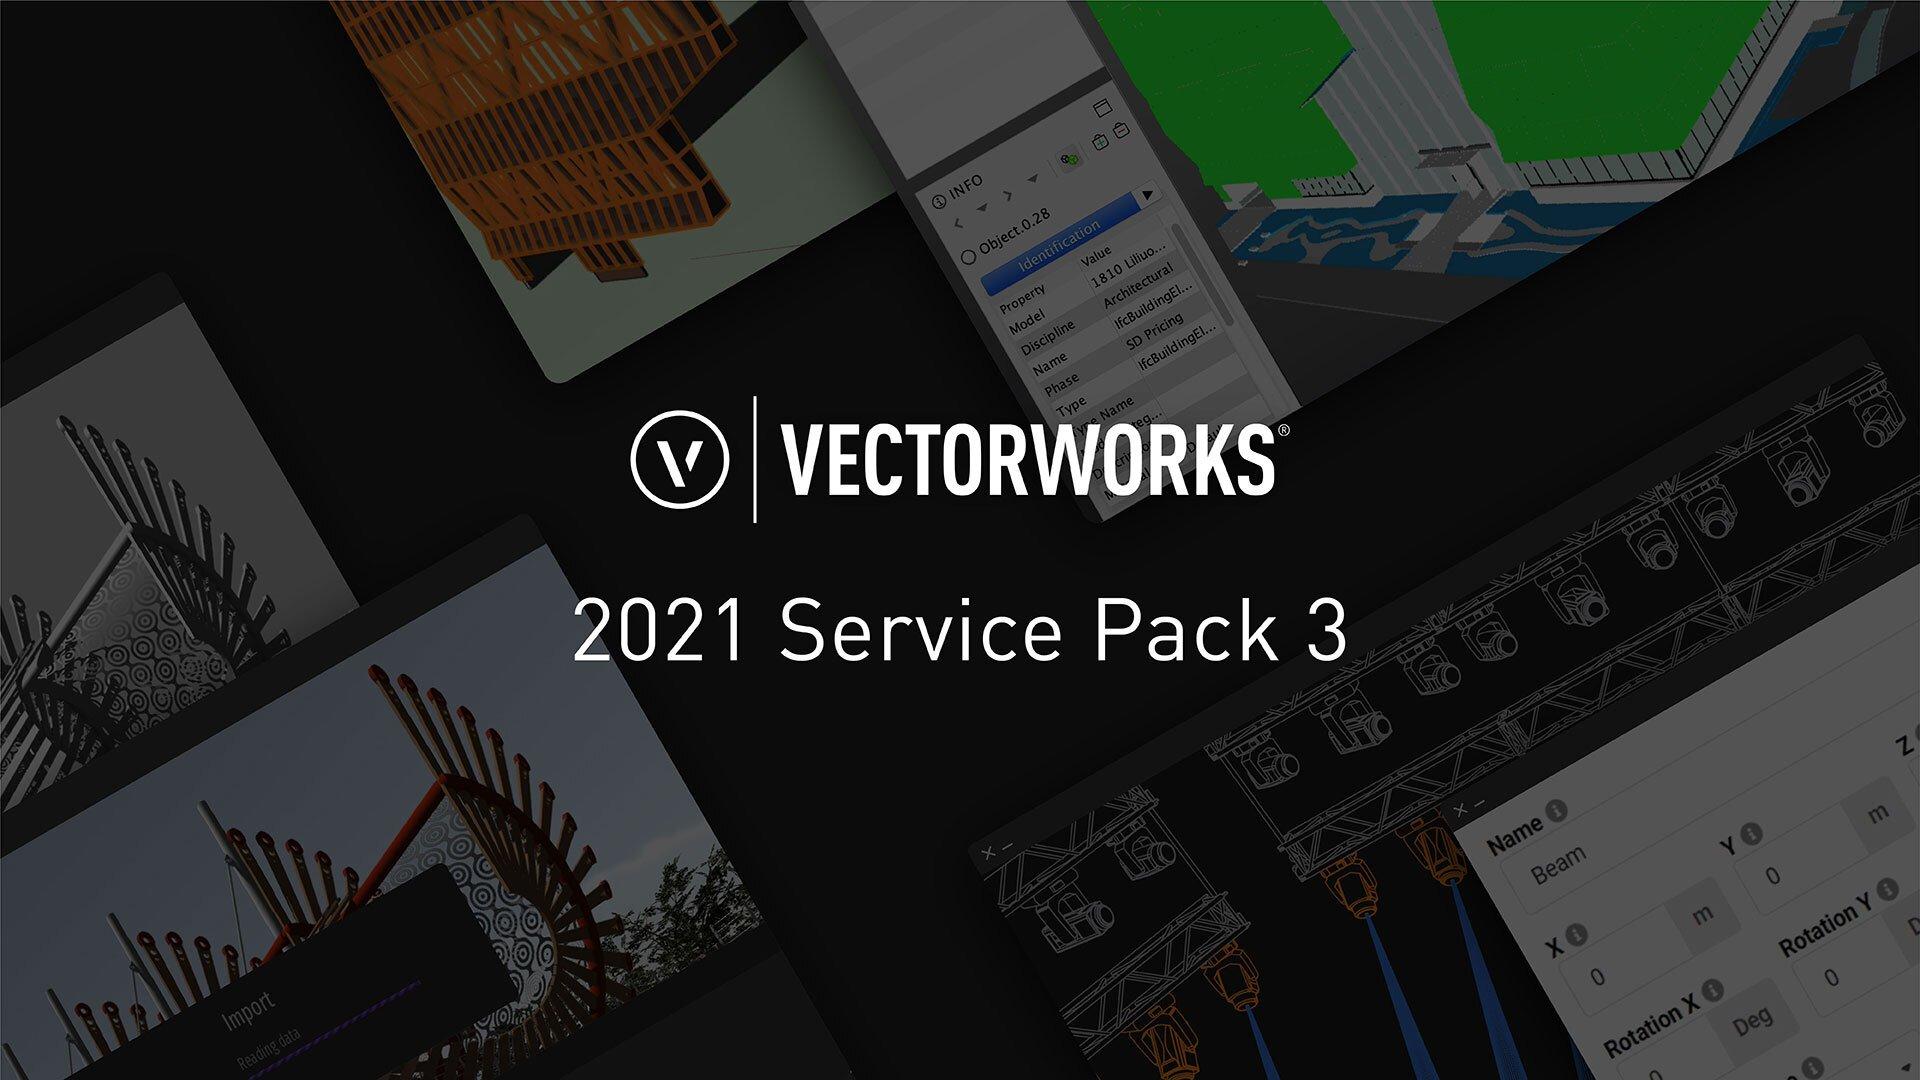 Vectorworks 2021 Service Pack 3